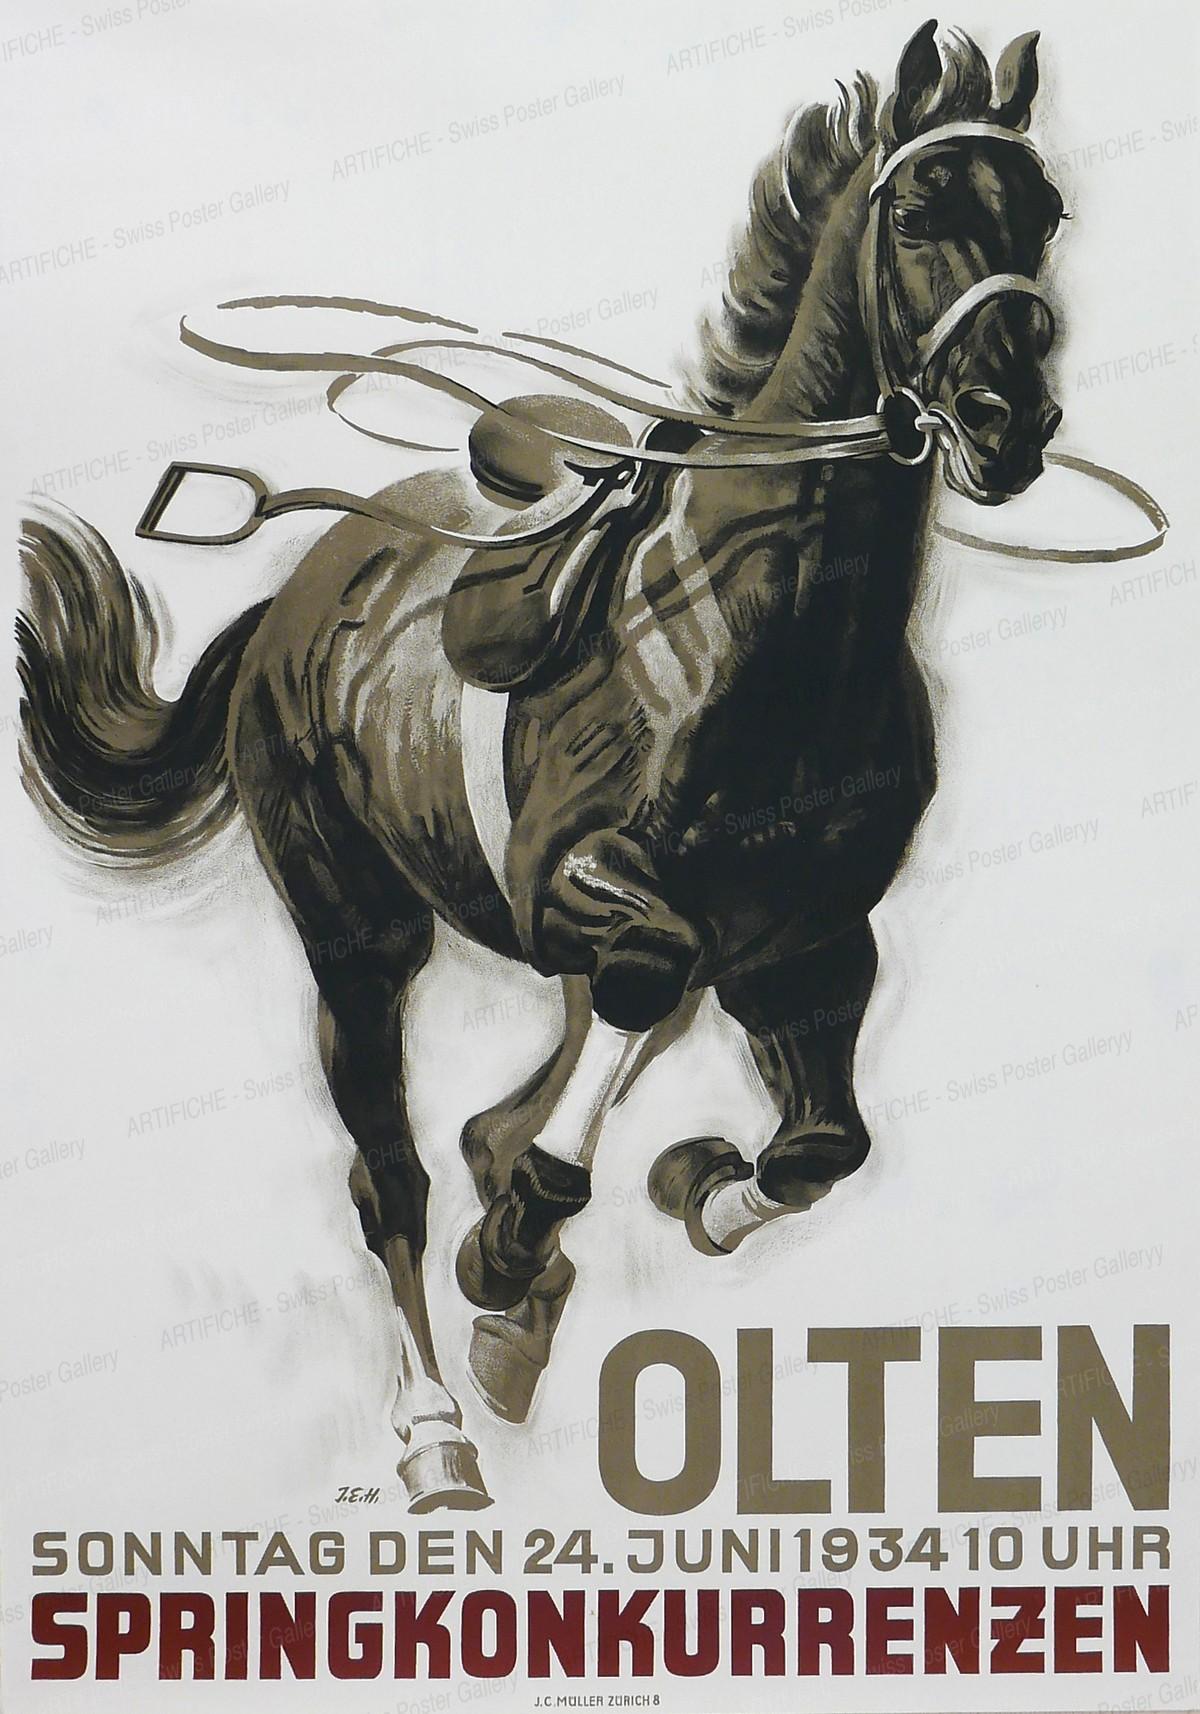 Springkonkurrenzen Olten, Iwan Edwin Hugentobler